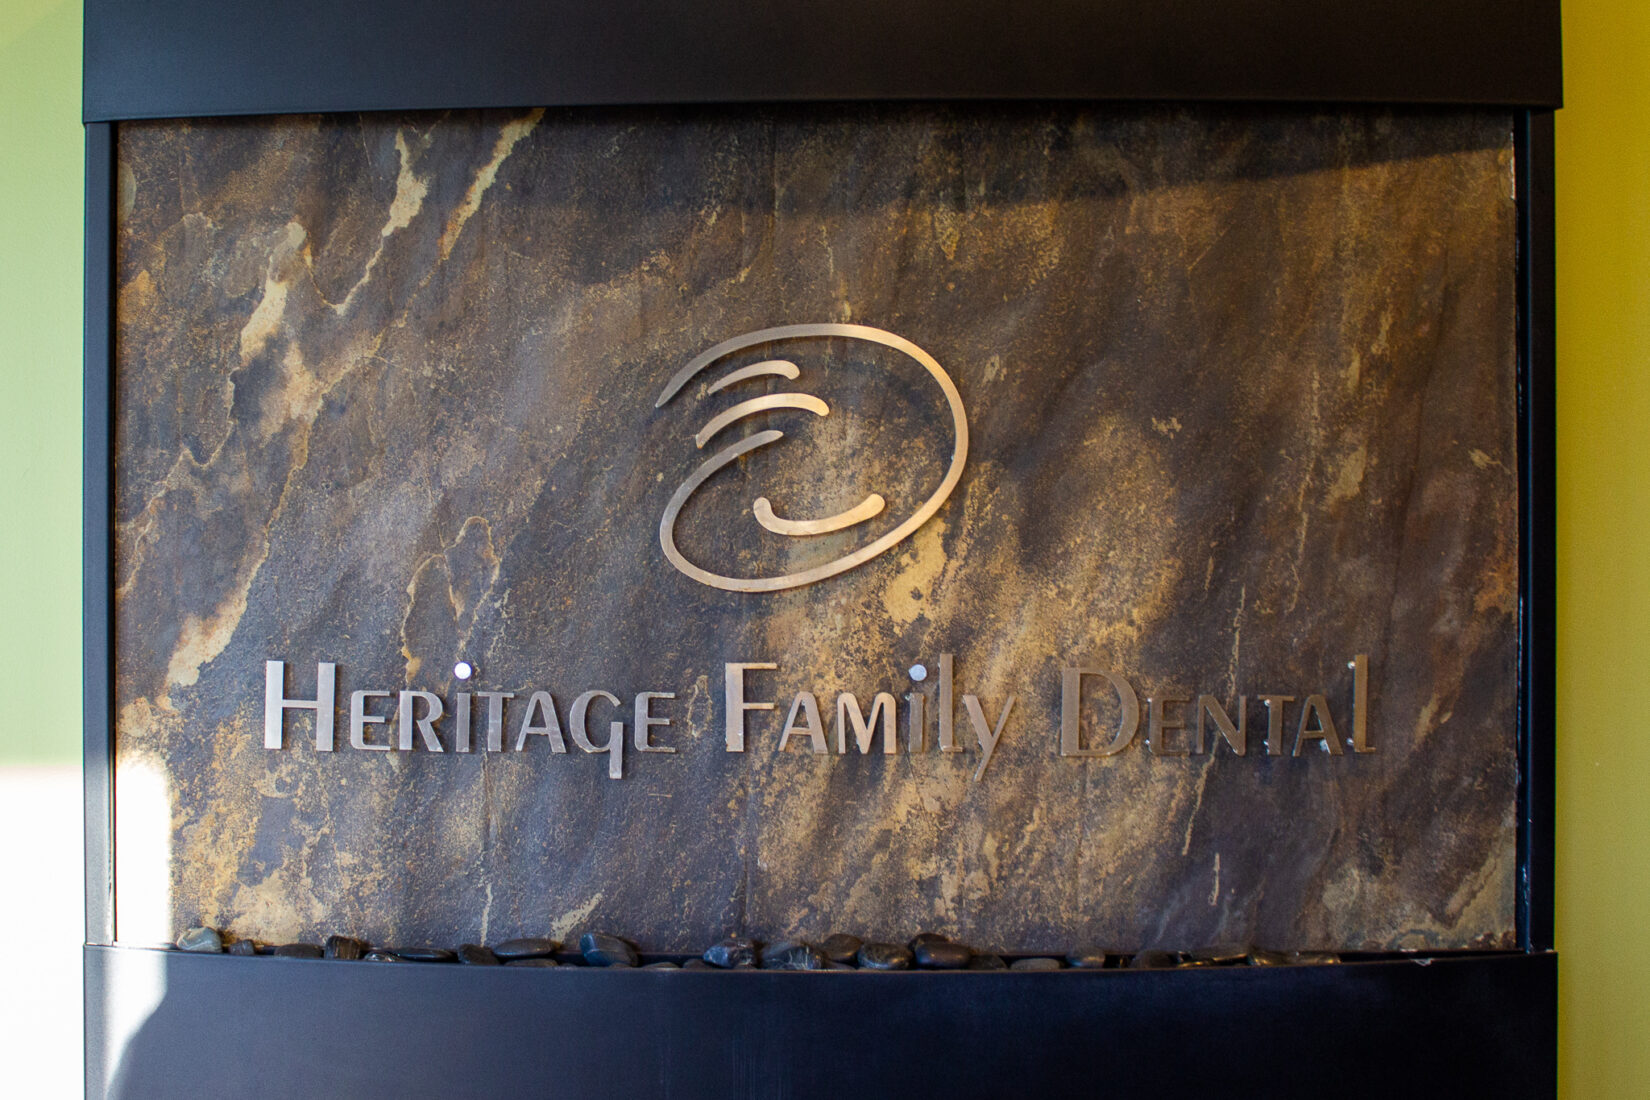 Business Spotlight: Heritage Family Dental